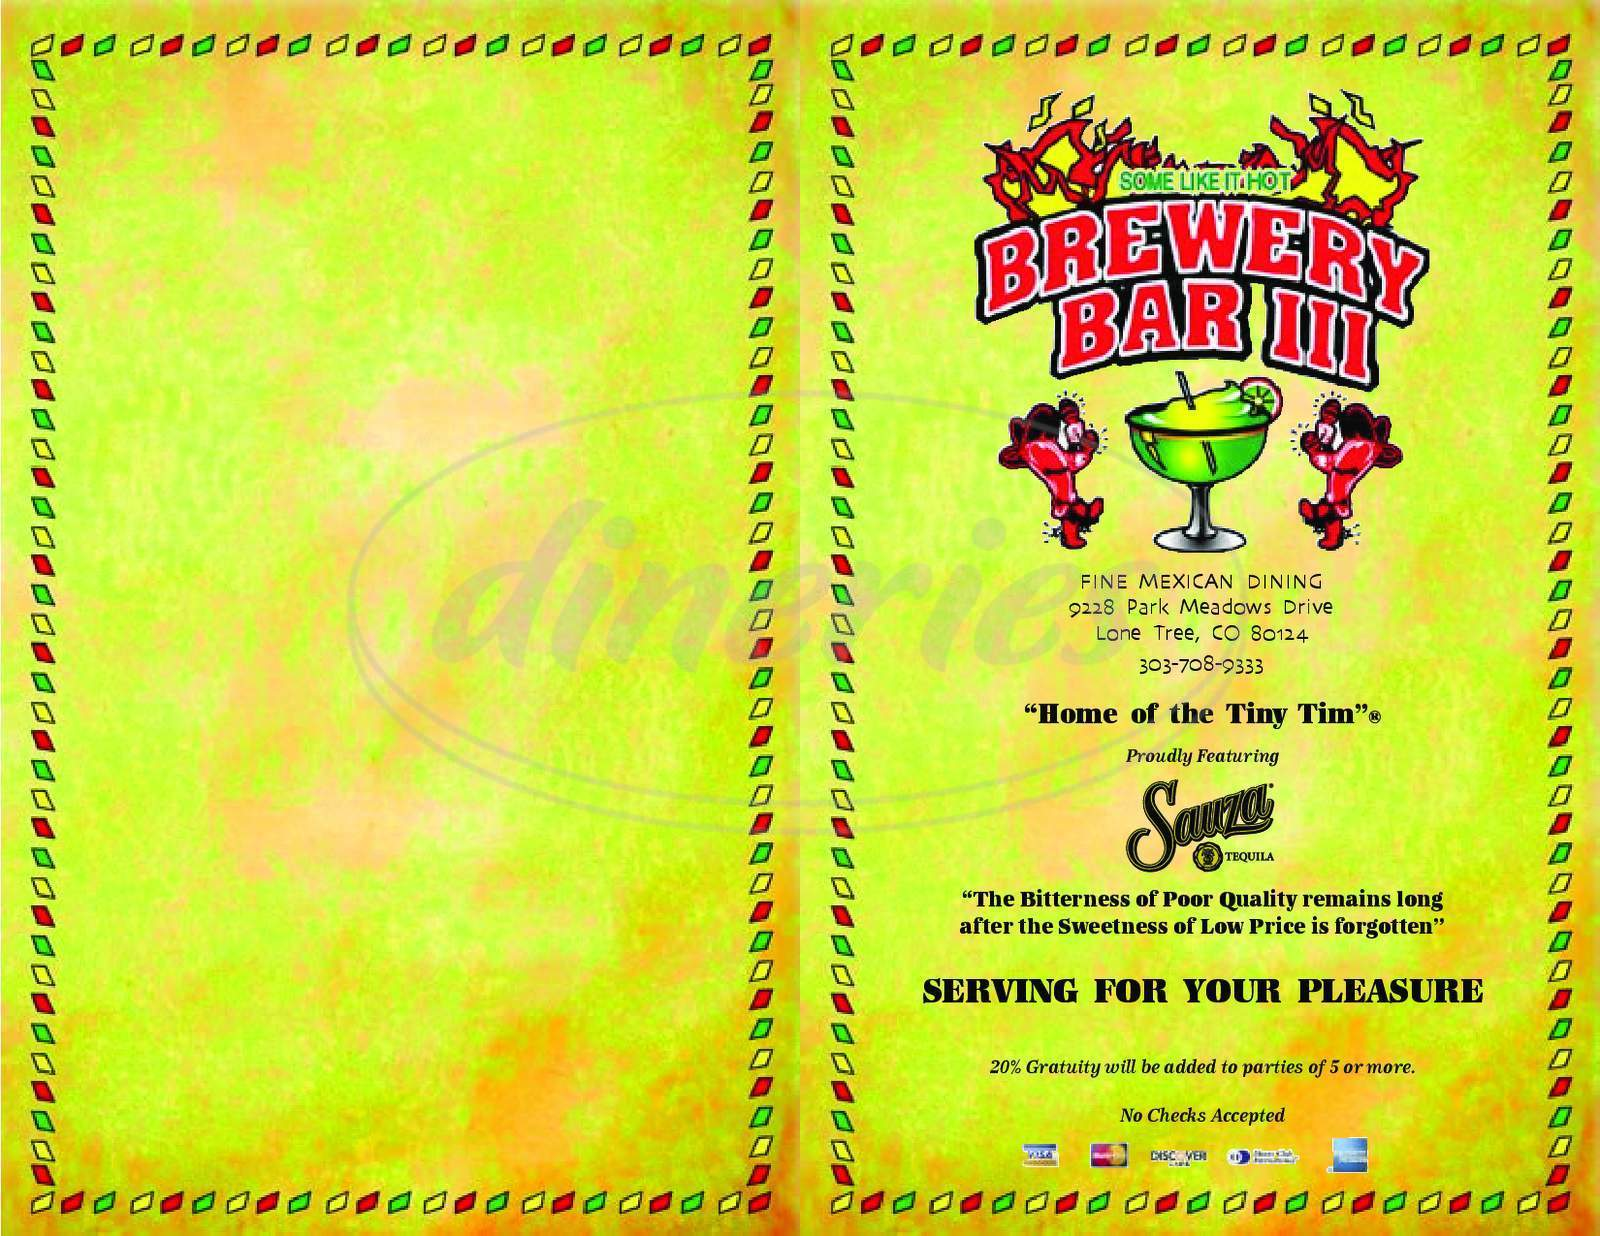 menu for Brewery Bar III